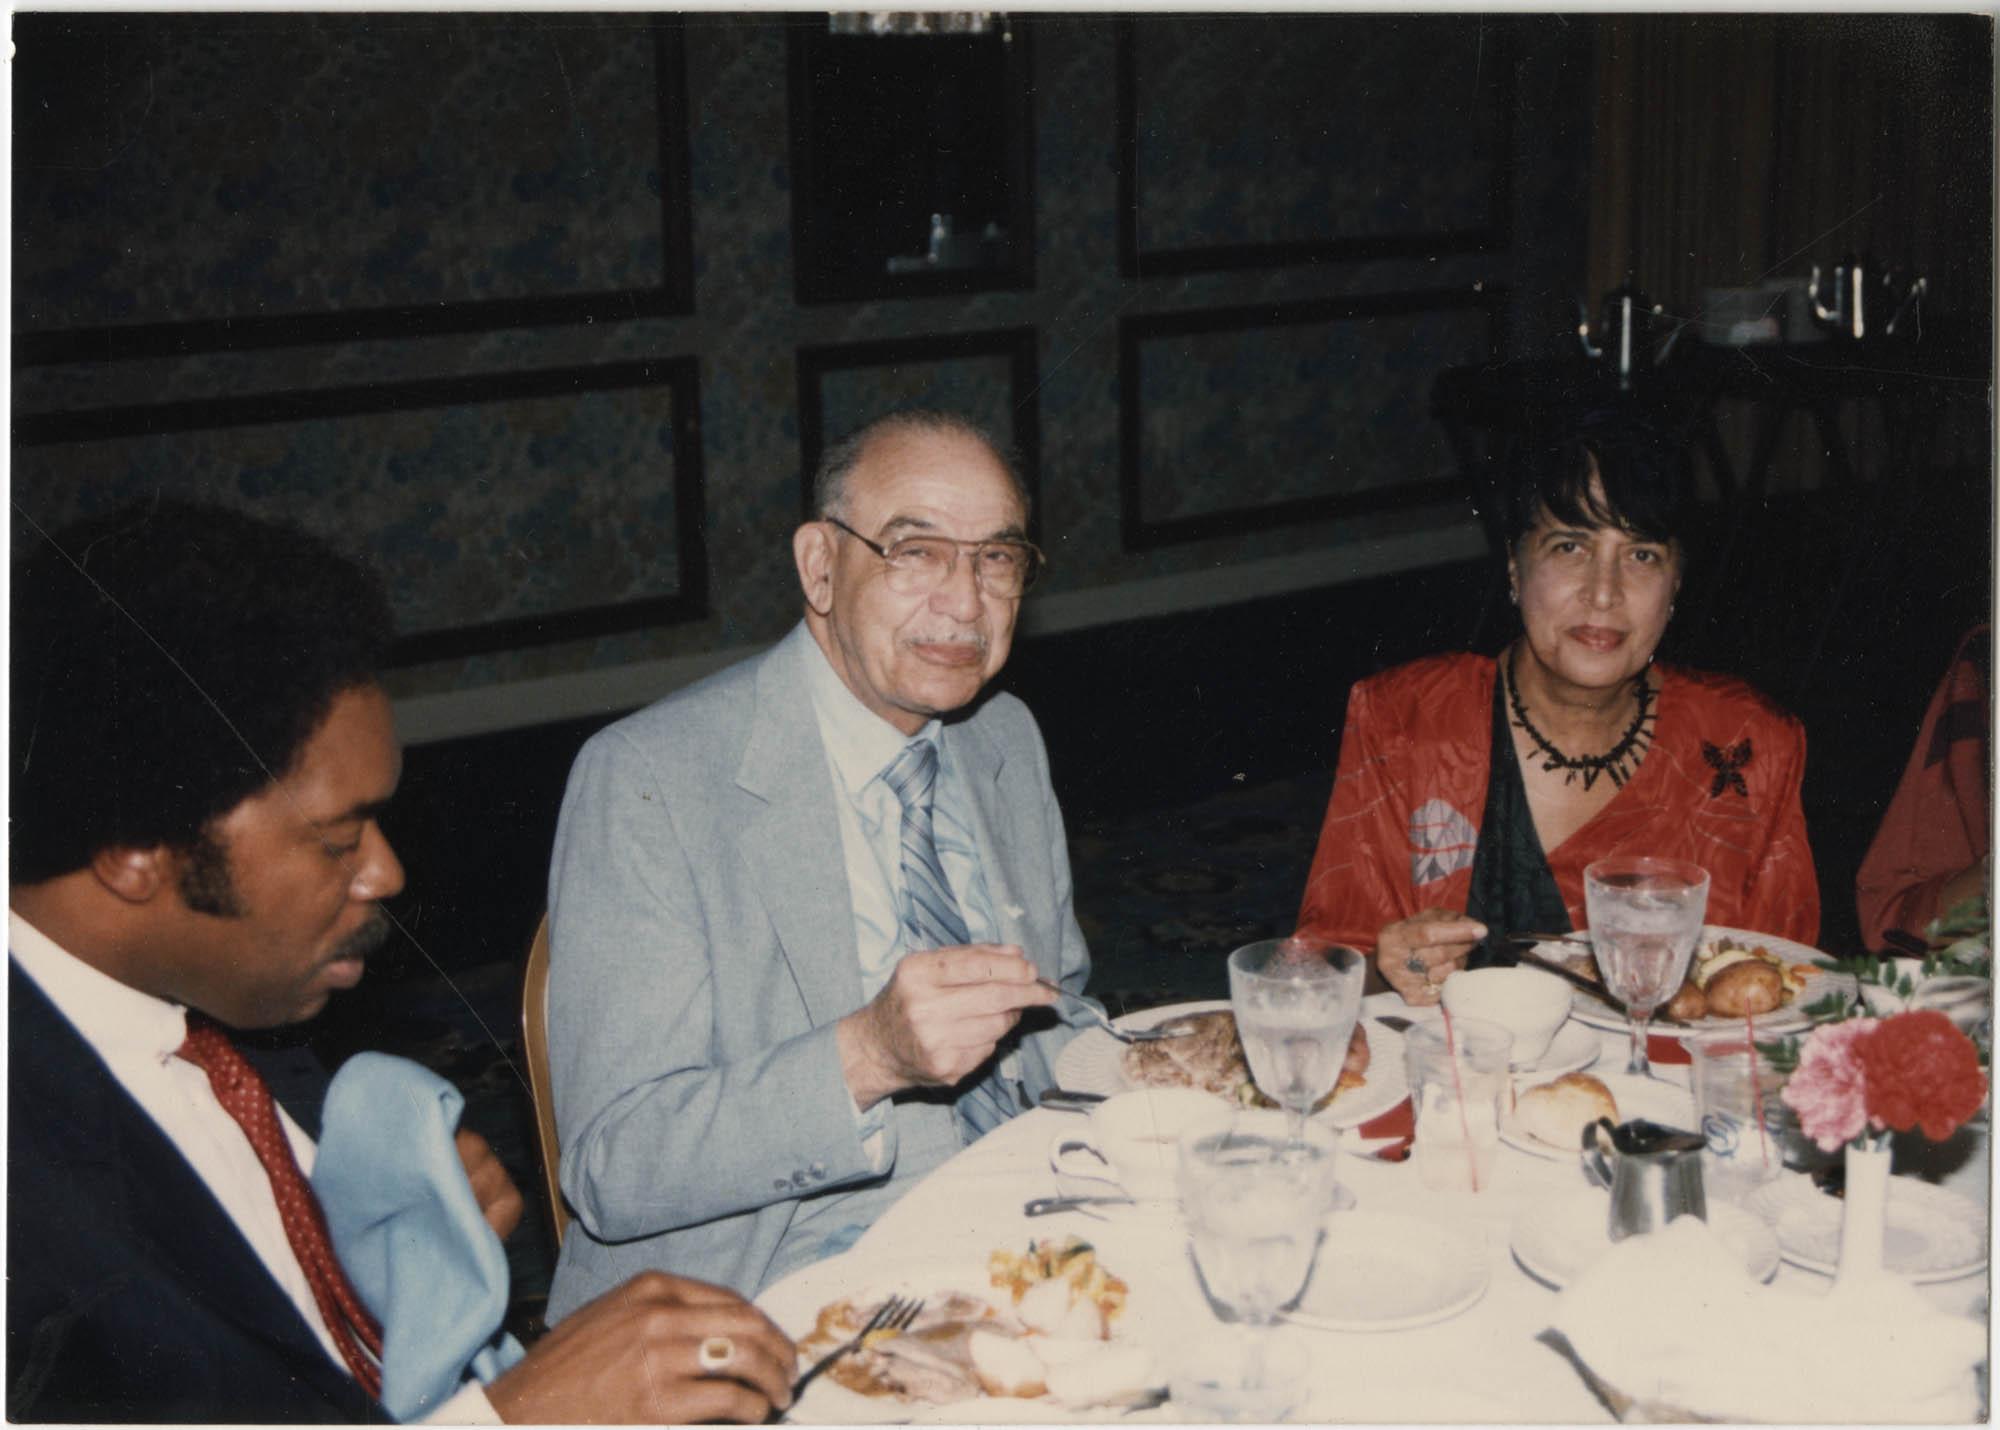 Photograph of Three People